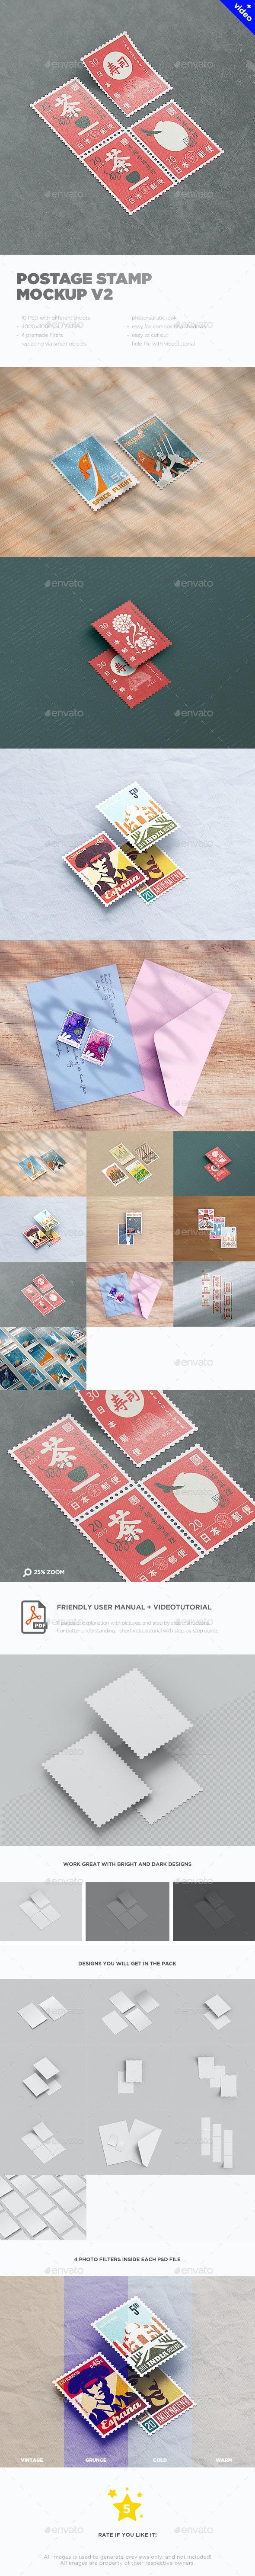 Postage Stamp MockUp v2 - Miscellaneous Print